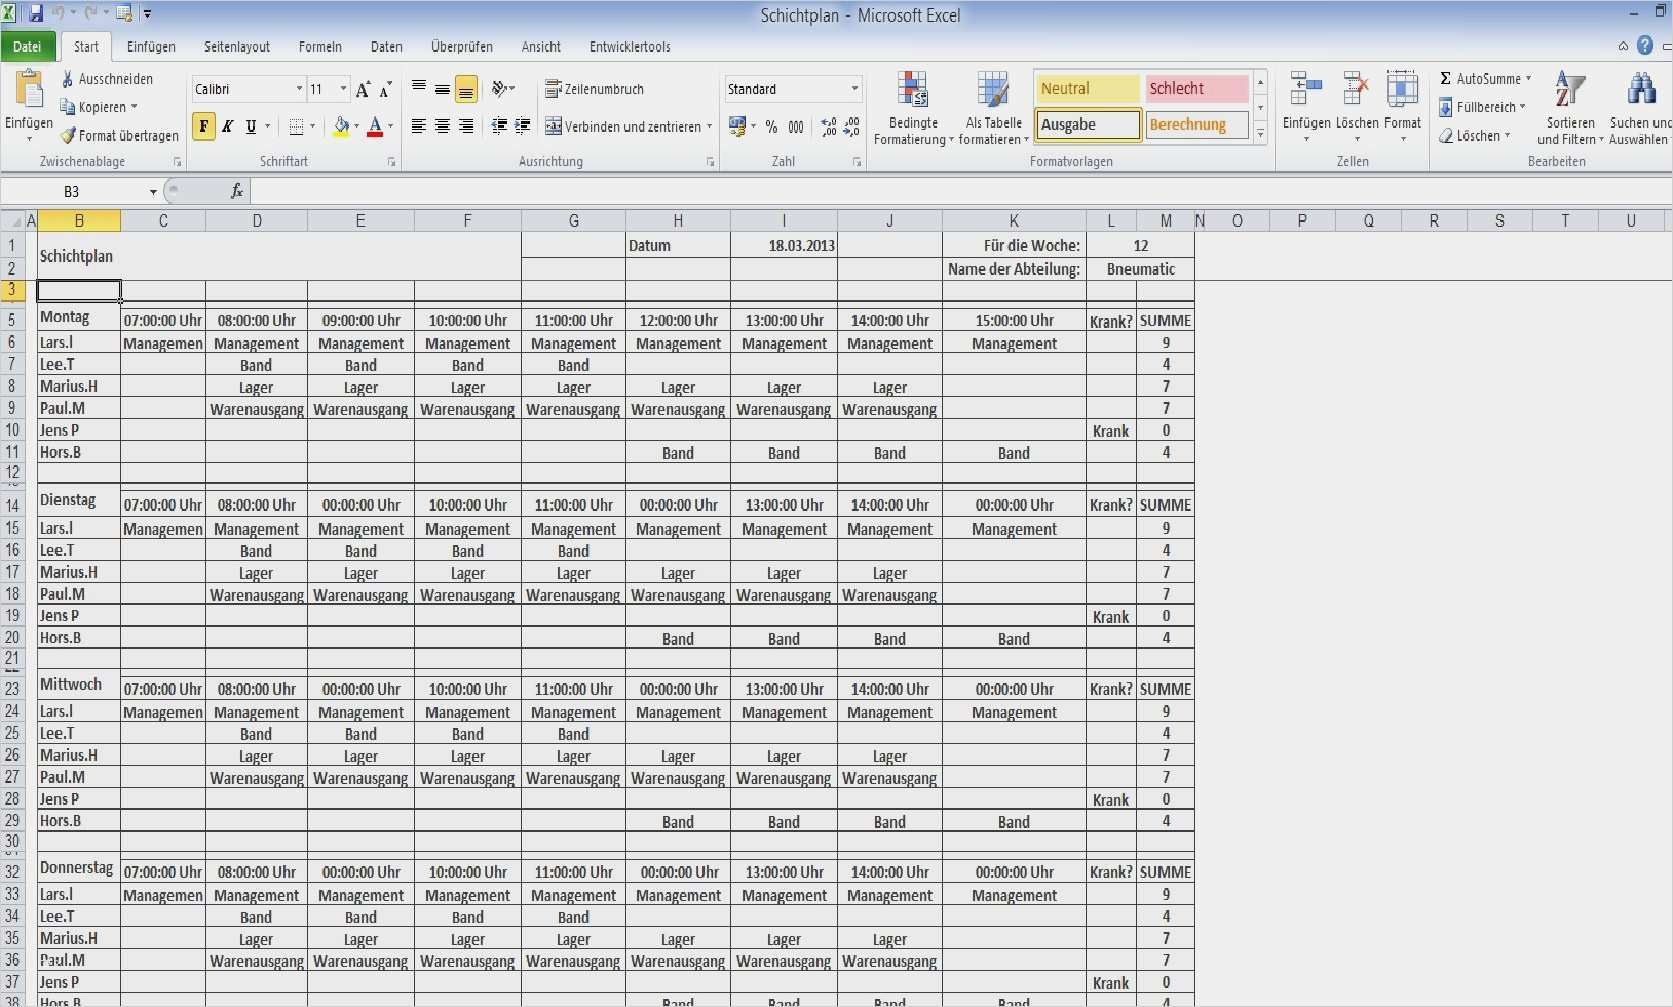 39 Wunderbar Produktionsplan Excel Vorlage Foto In 2020 Excel Vorlage Microsoft Excel Vorlagen